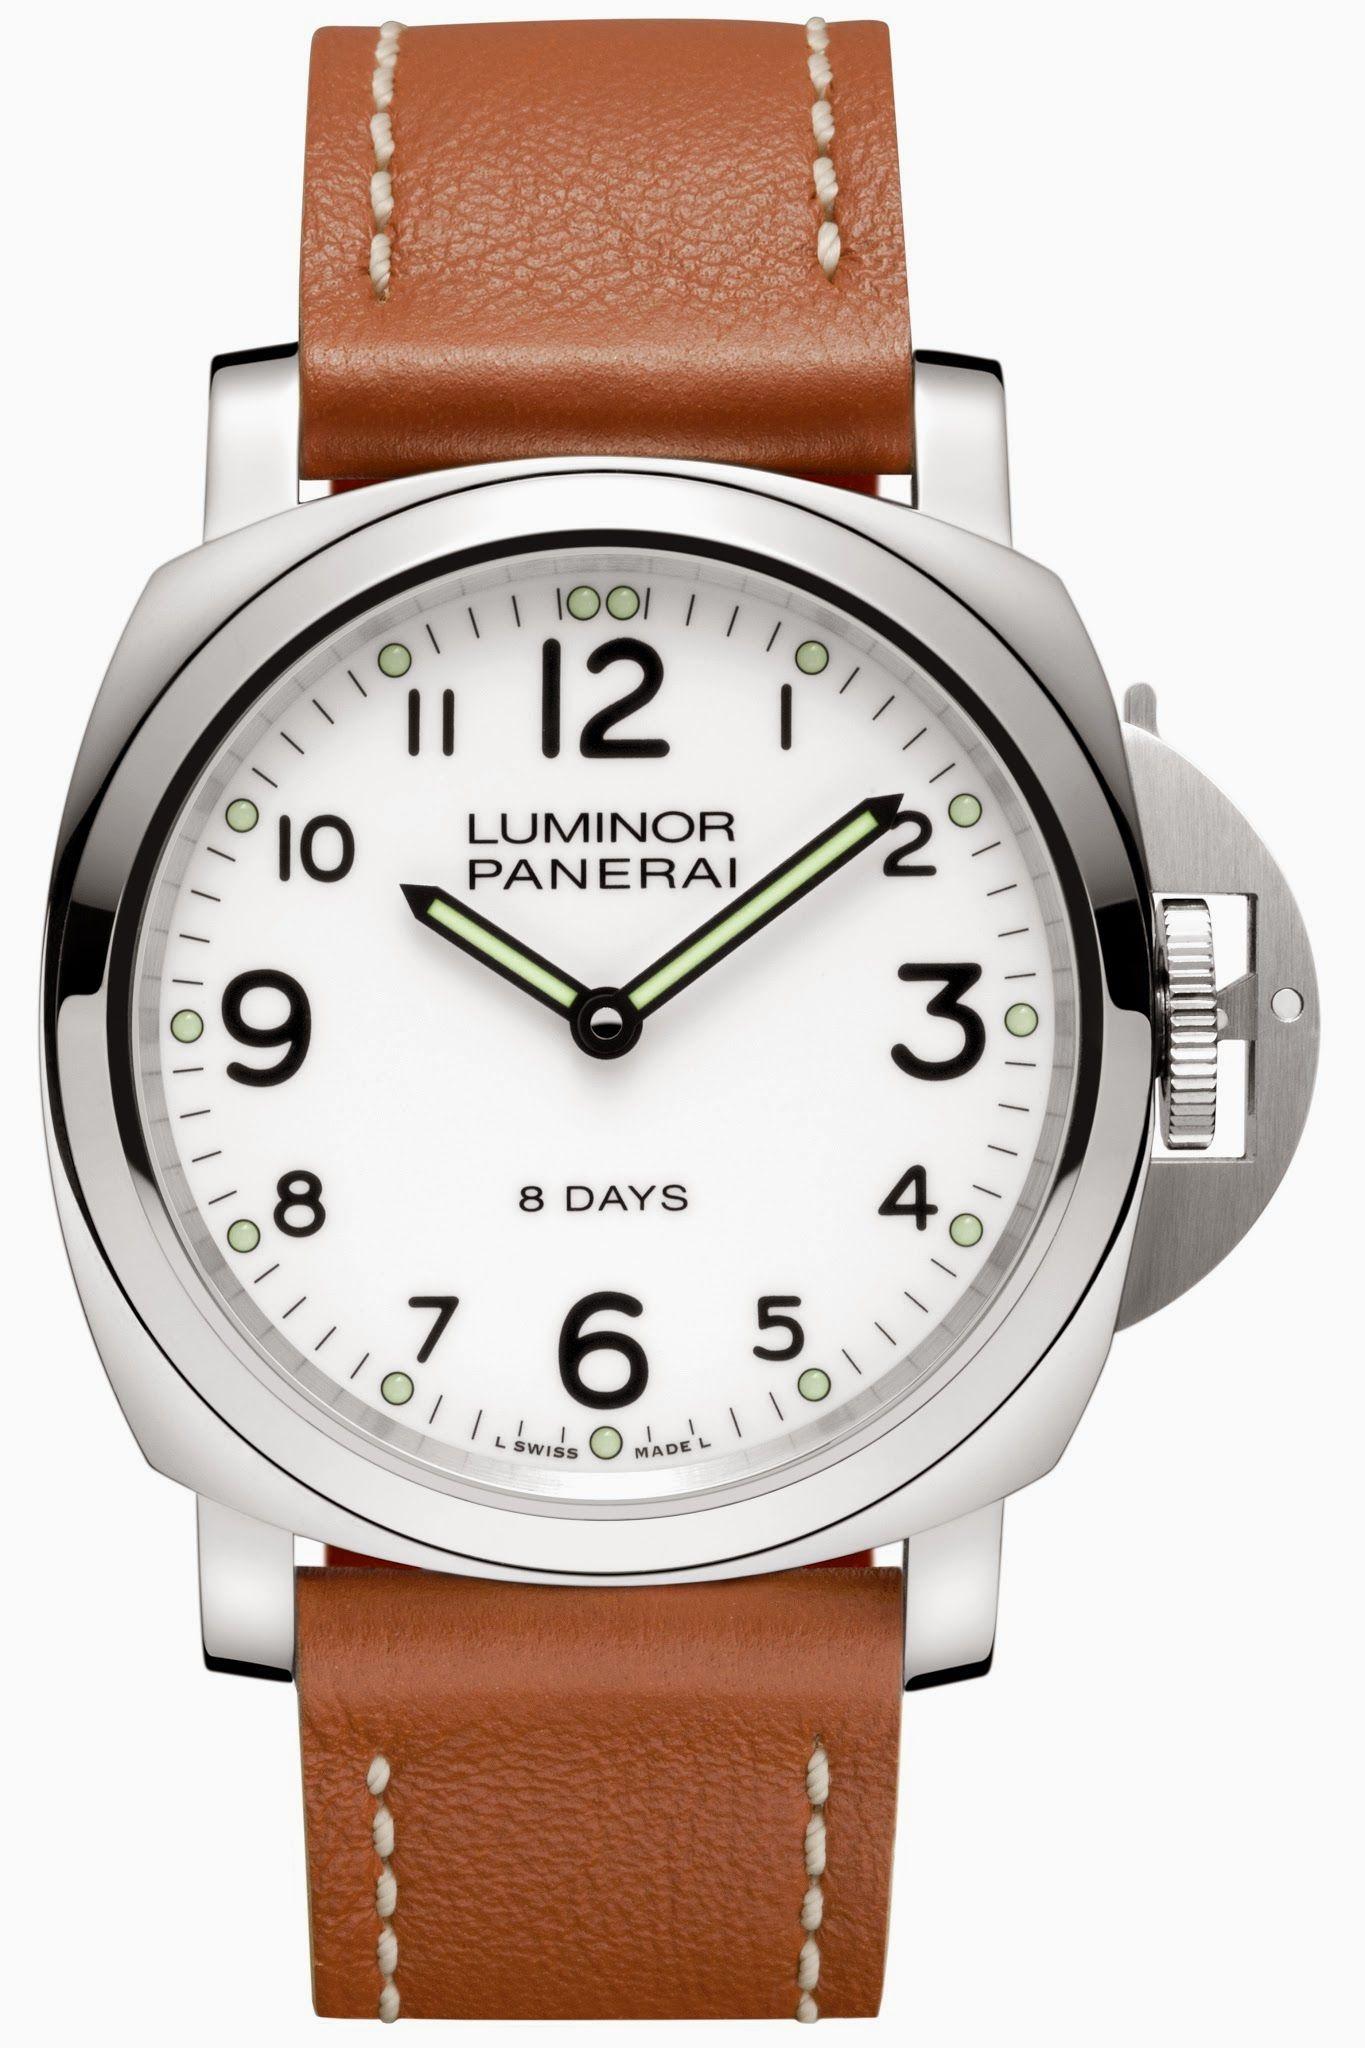 8a6abe7655 Panerai PAM 561 Luminor Base 8 Days Acciaio 44mm (White Dial) (List Price:  HK$53,900). Discount at HK$39,999.